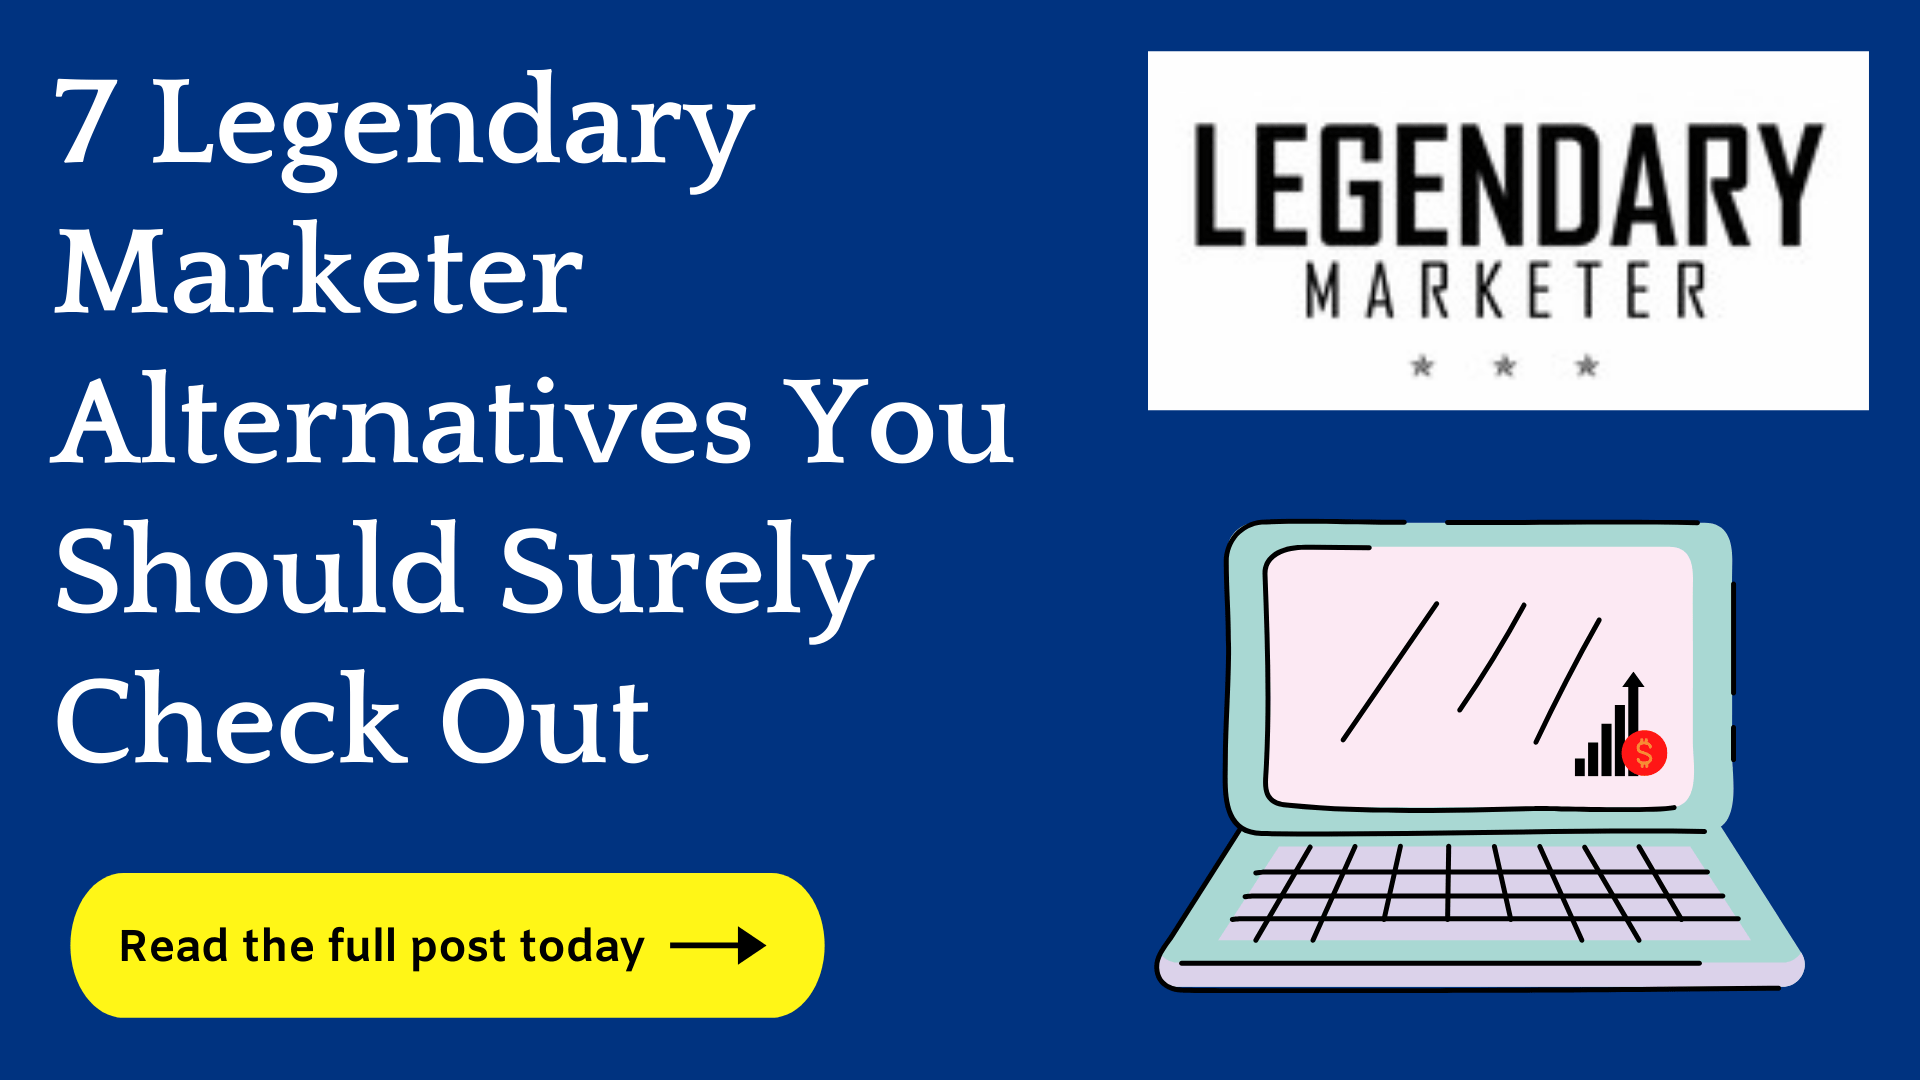 Legendary Marketer Alternatives